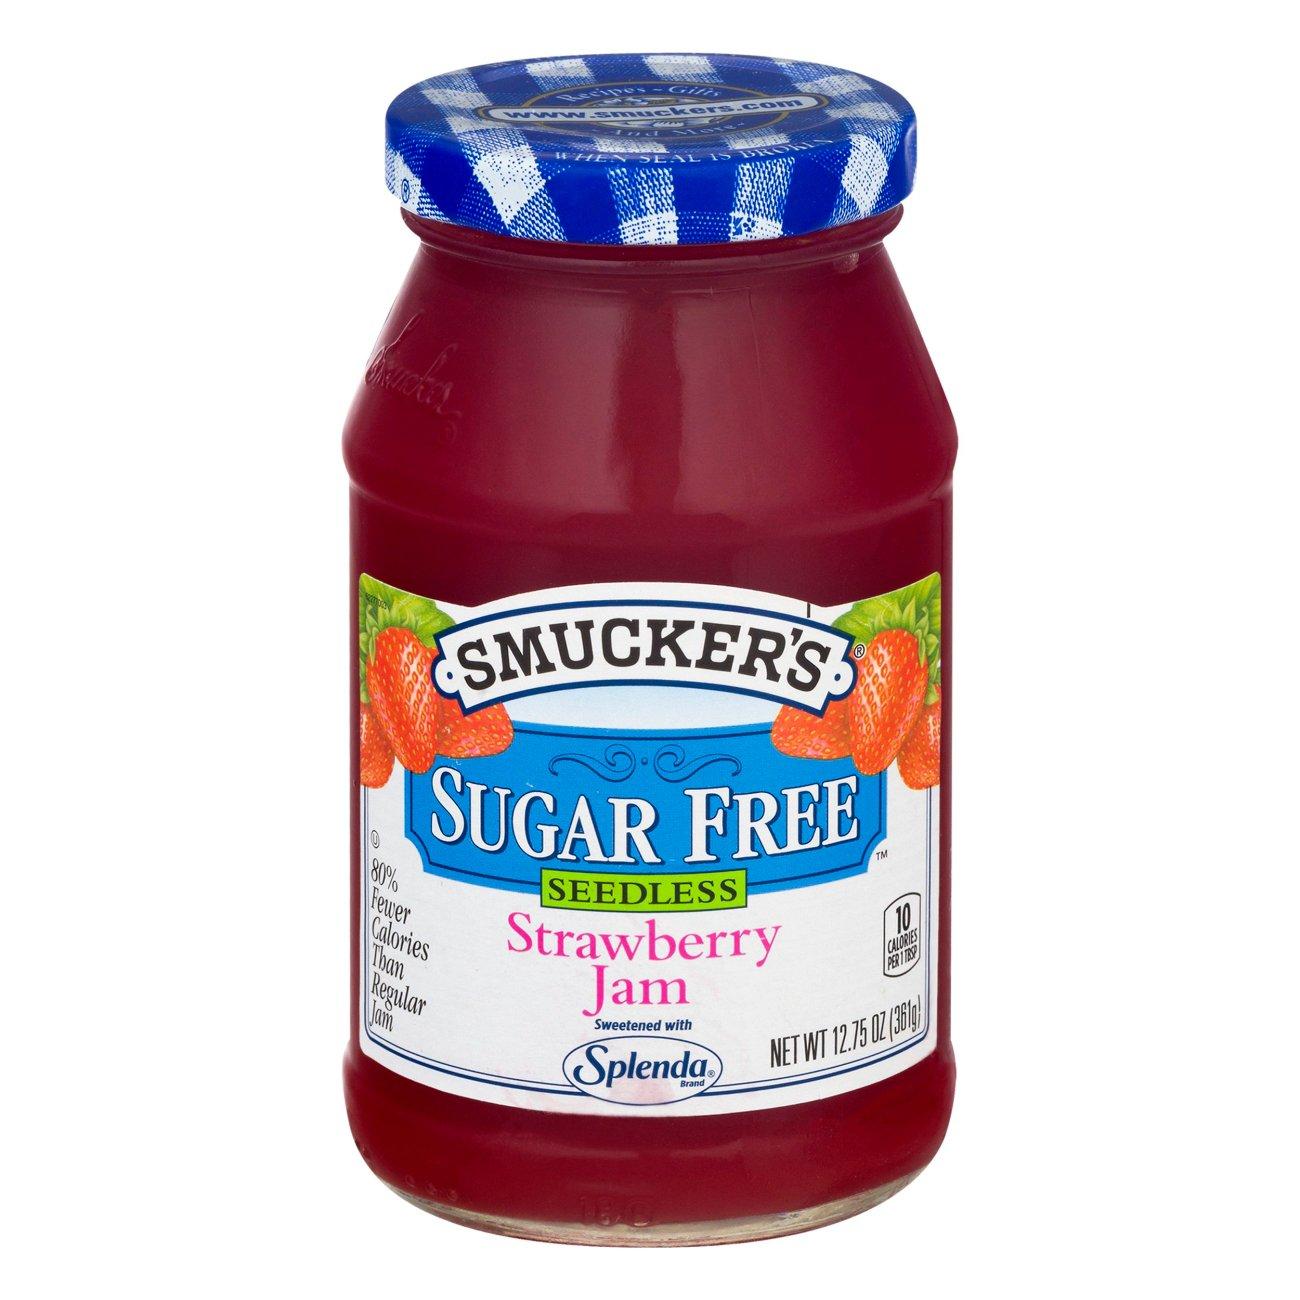 Sugar Free Seedless Strawberry Jam